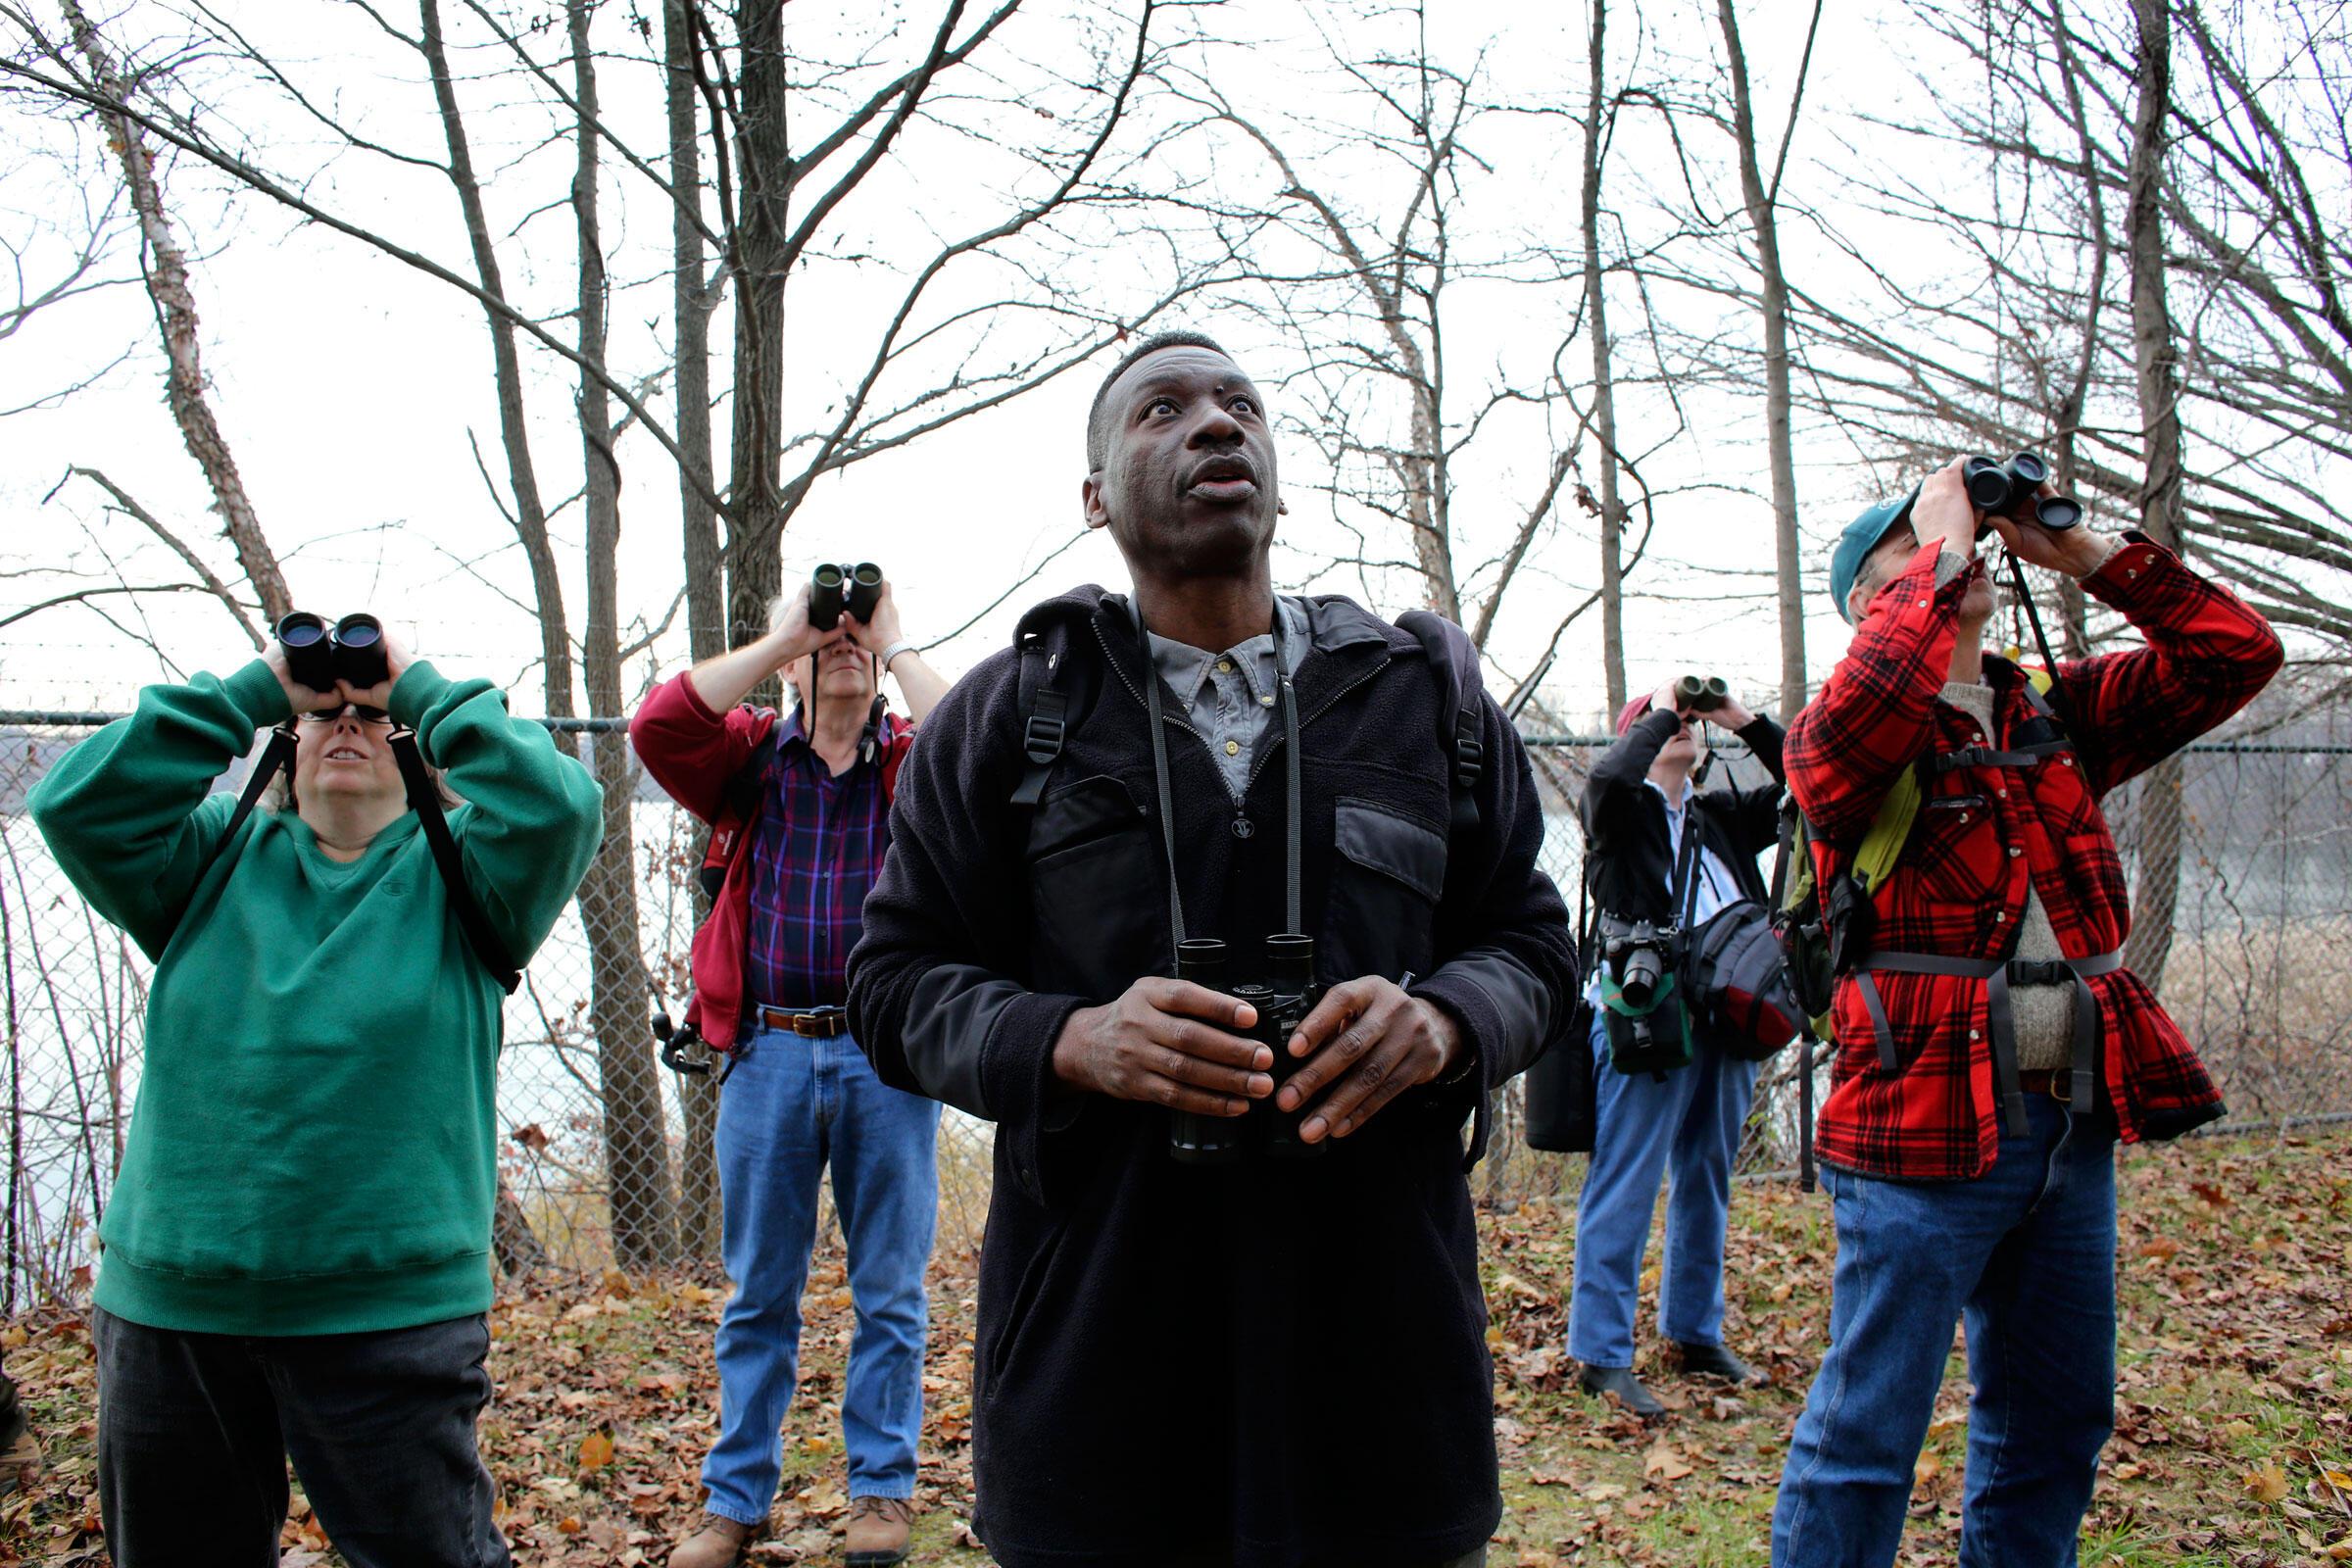 Keith Russell, program manager for Urban Conservation, Audubon Pennsylvania, center, leads a tour of the East Park Reservoir in the Strawberry Mansion section of Philadelphia on December 12, 2015. Joseph Kaczmarek